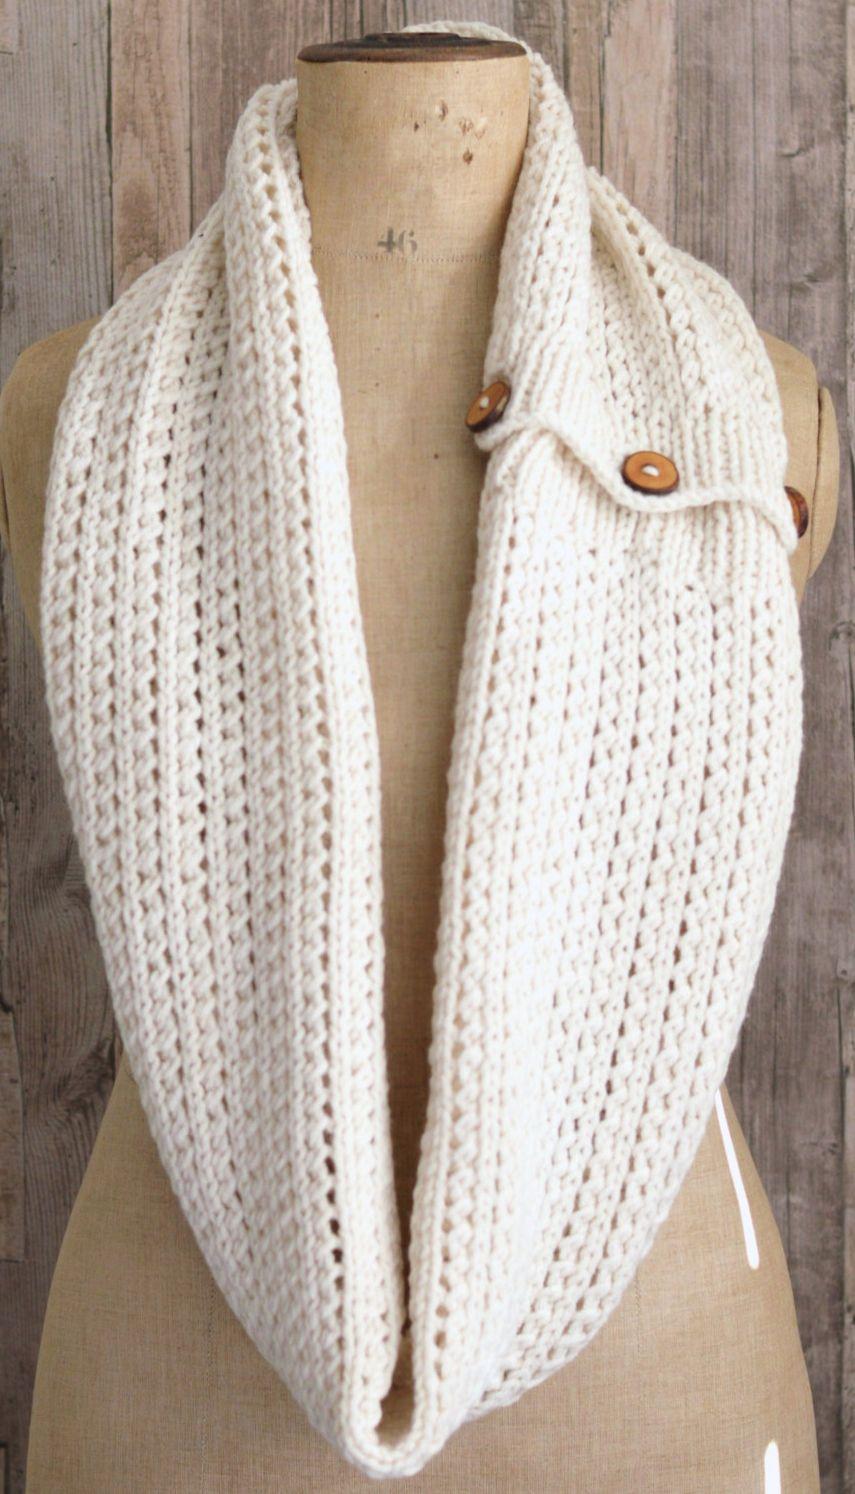 Knitting pattern for easy rib mesh infinity scarf ad versatile knitting pattern for easy rib mesh infinity scarf ad versatile lace scarf can be bankloansurffo Choice Image